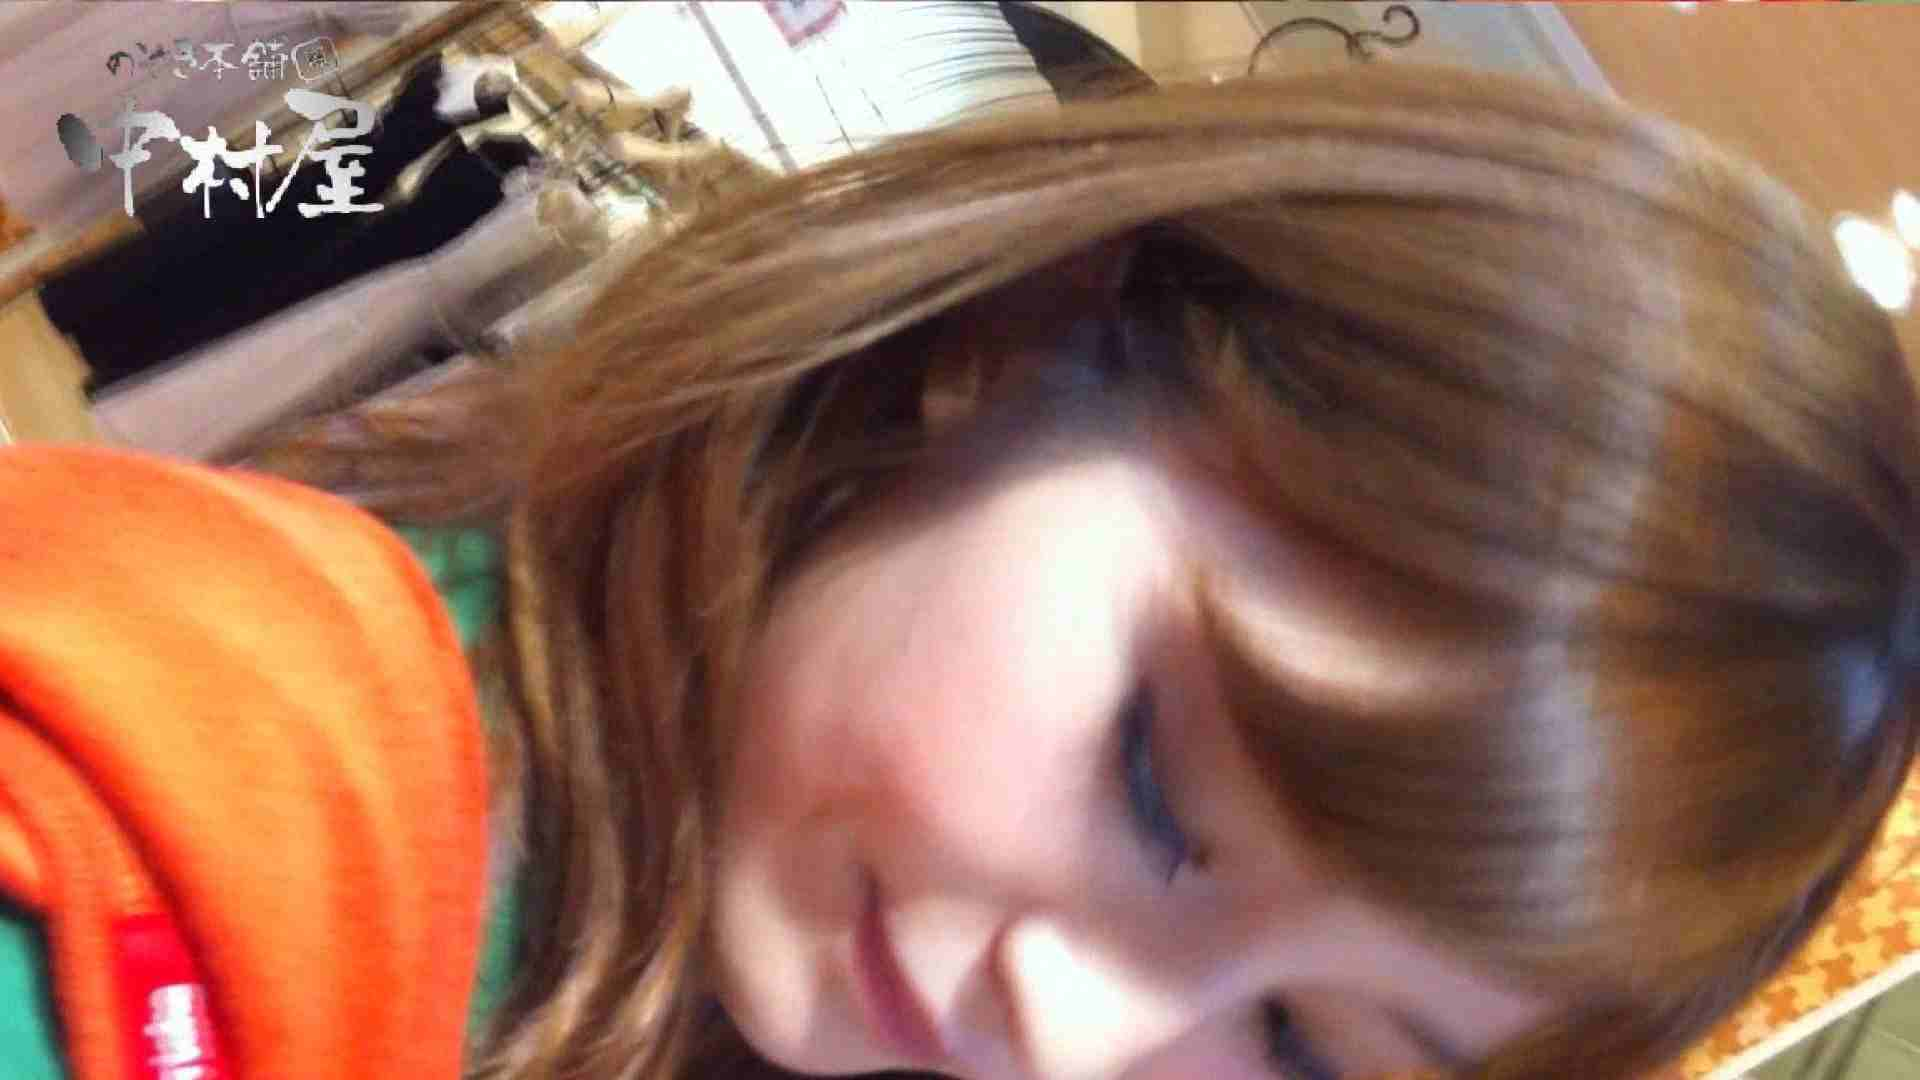 vol.48可愛いカリスマ店員胸チラ&パンチラ アニメ声の店員さん パンチラ | チラ  110画像 11